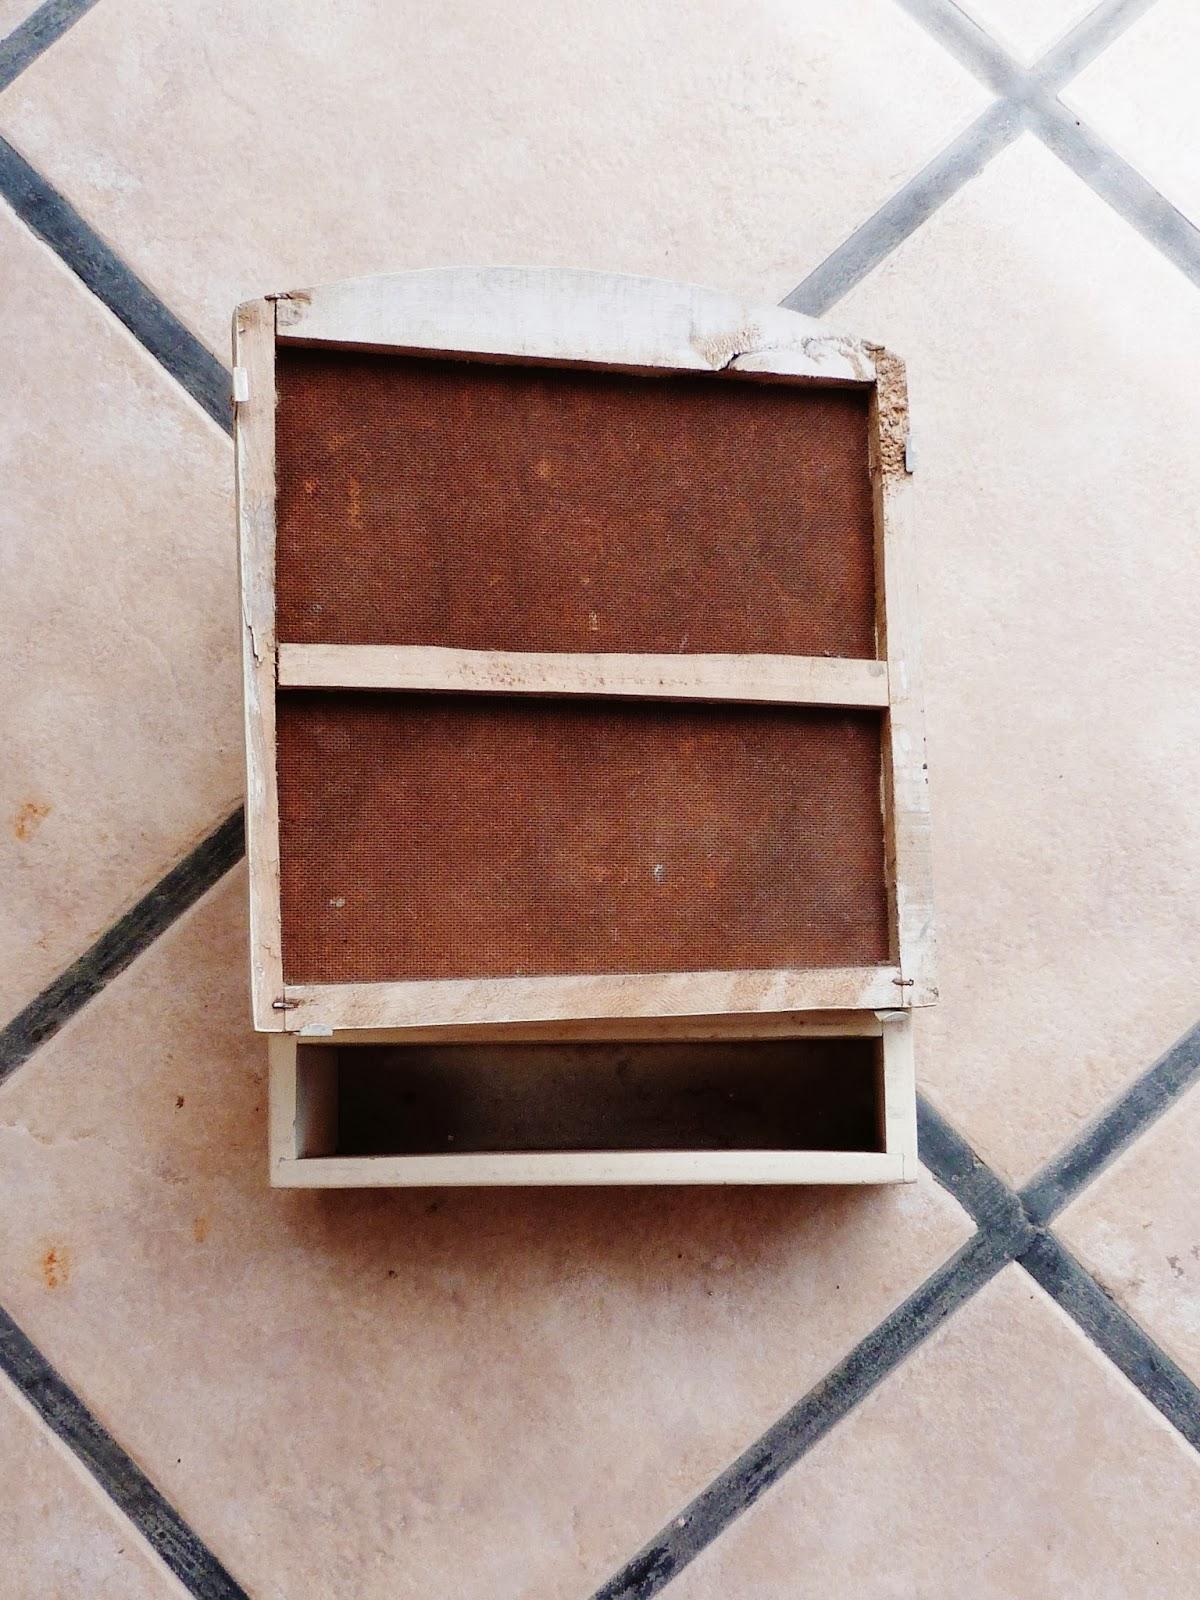 Espacio pipi perez 1 mueble radioactivo botiqu n reciclado for Mueble botiquin